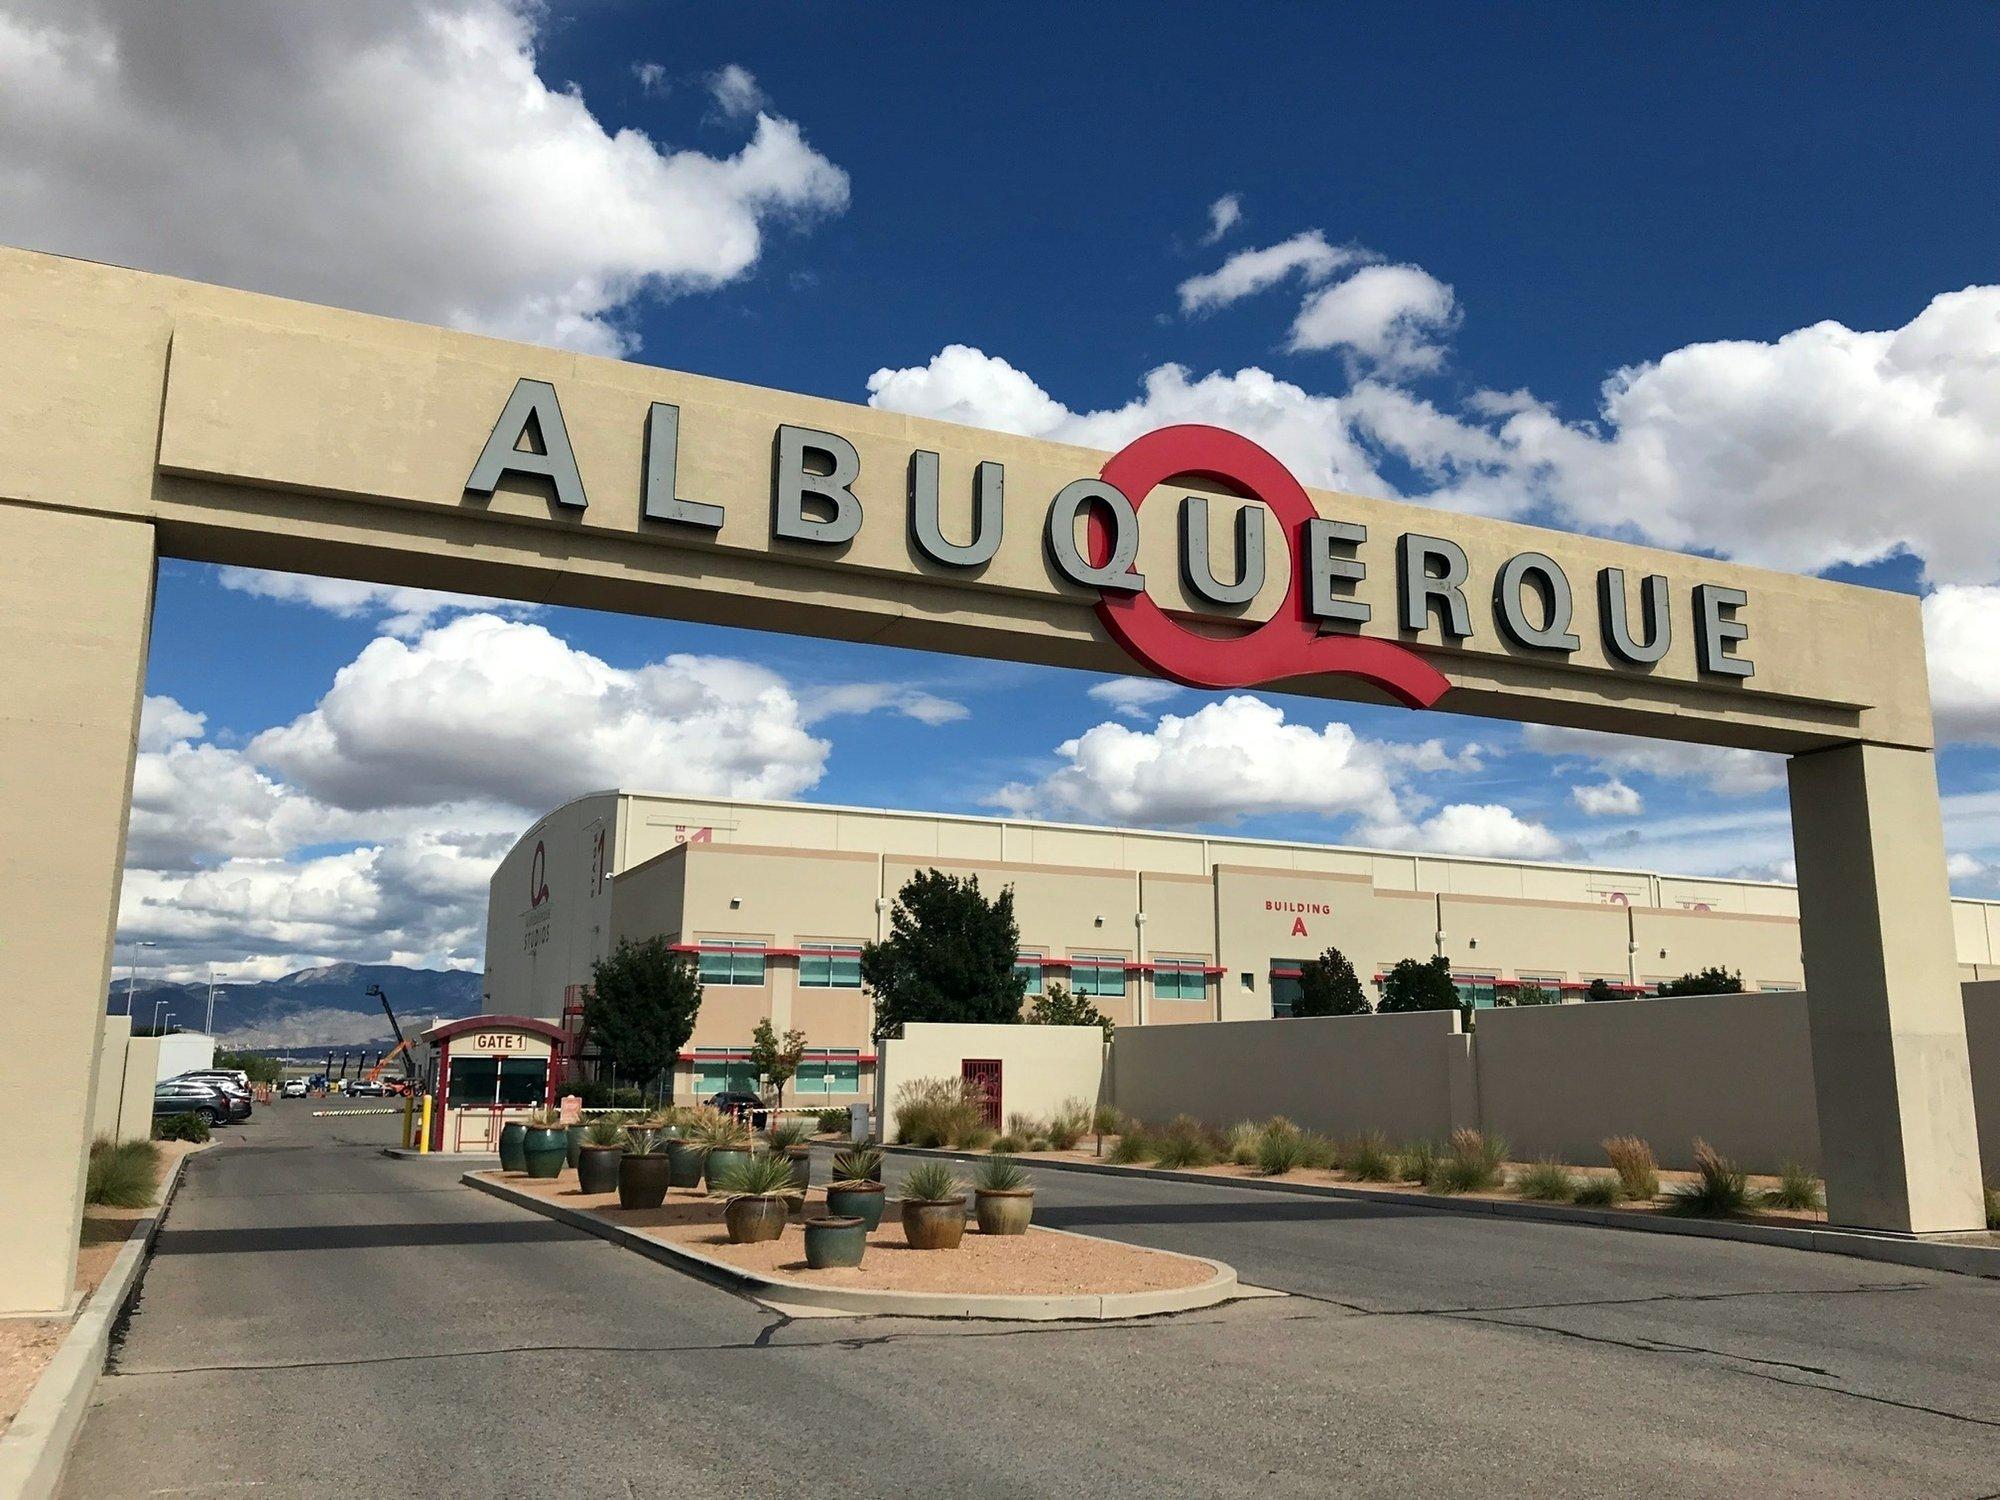 University of New Mexico revamps film program amid demand